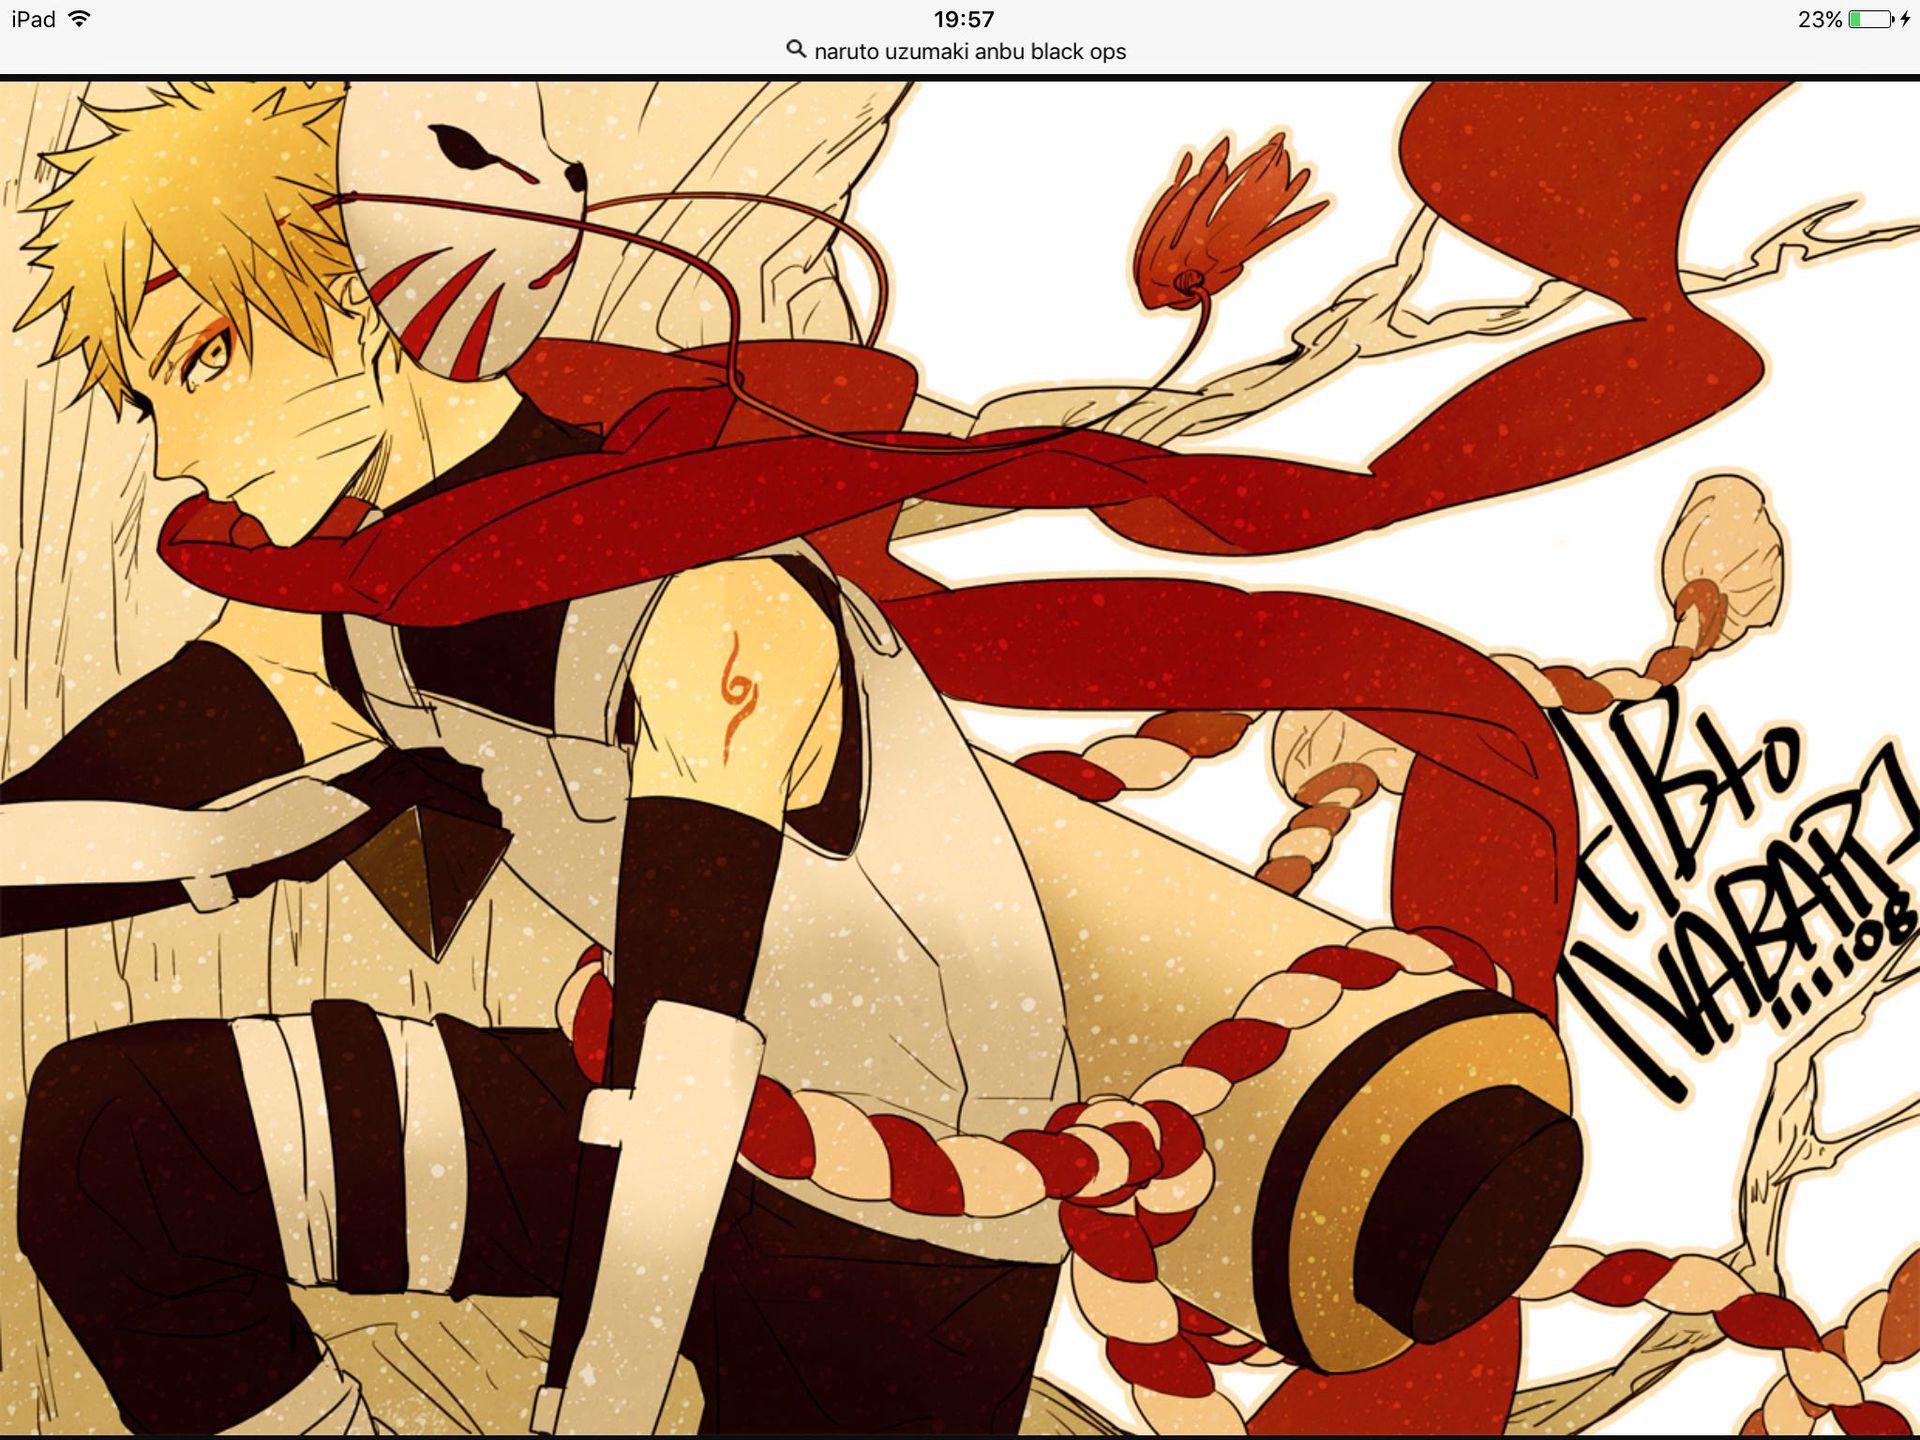 Naruto fanfiction) Abandoned and Betrayed - Team fox